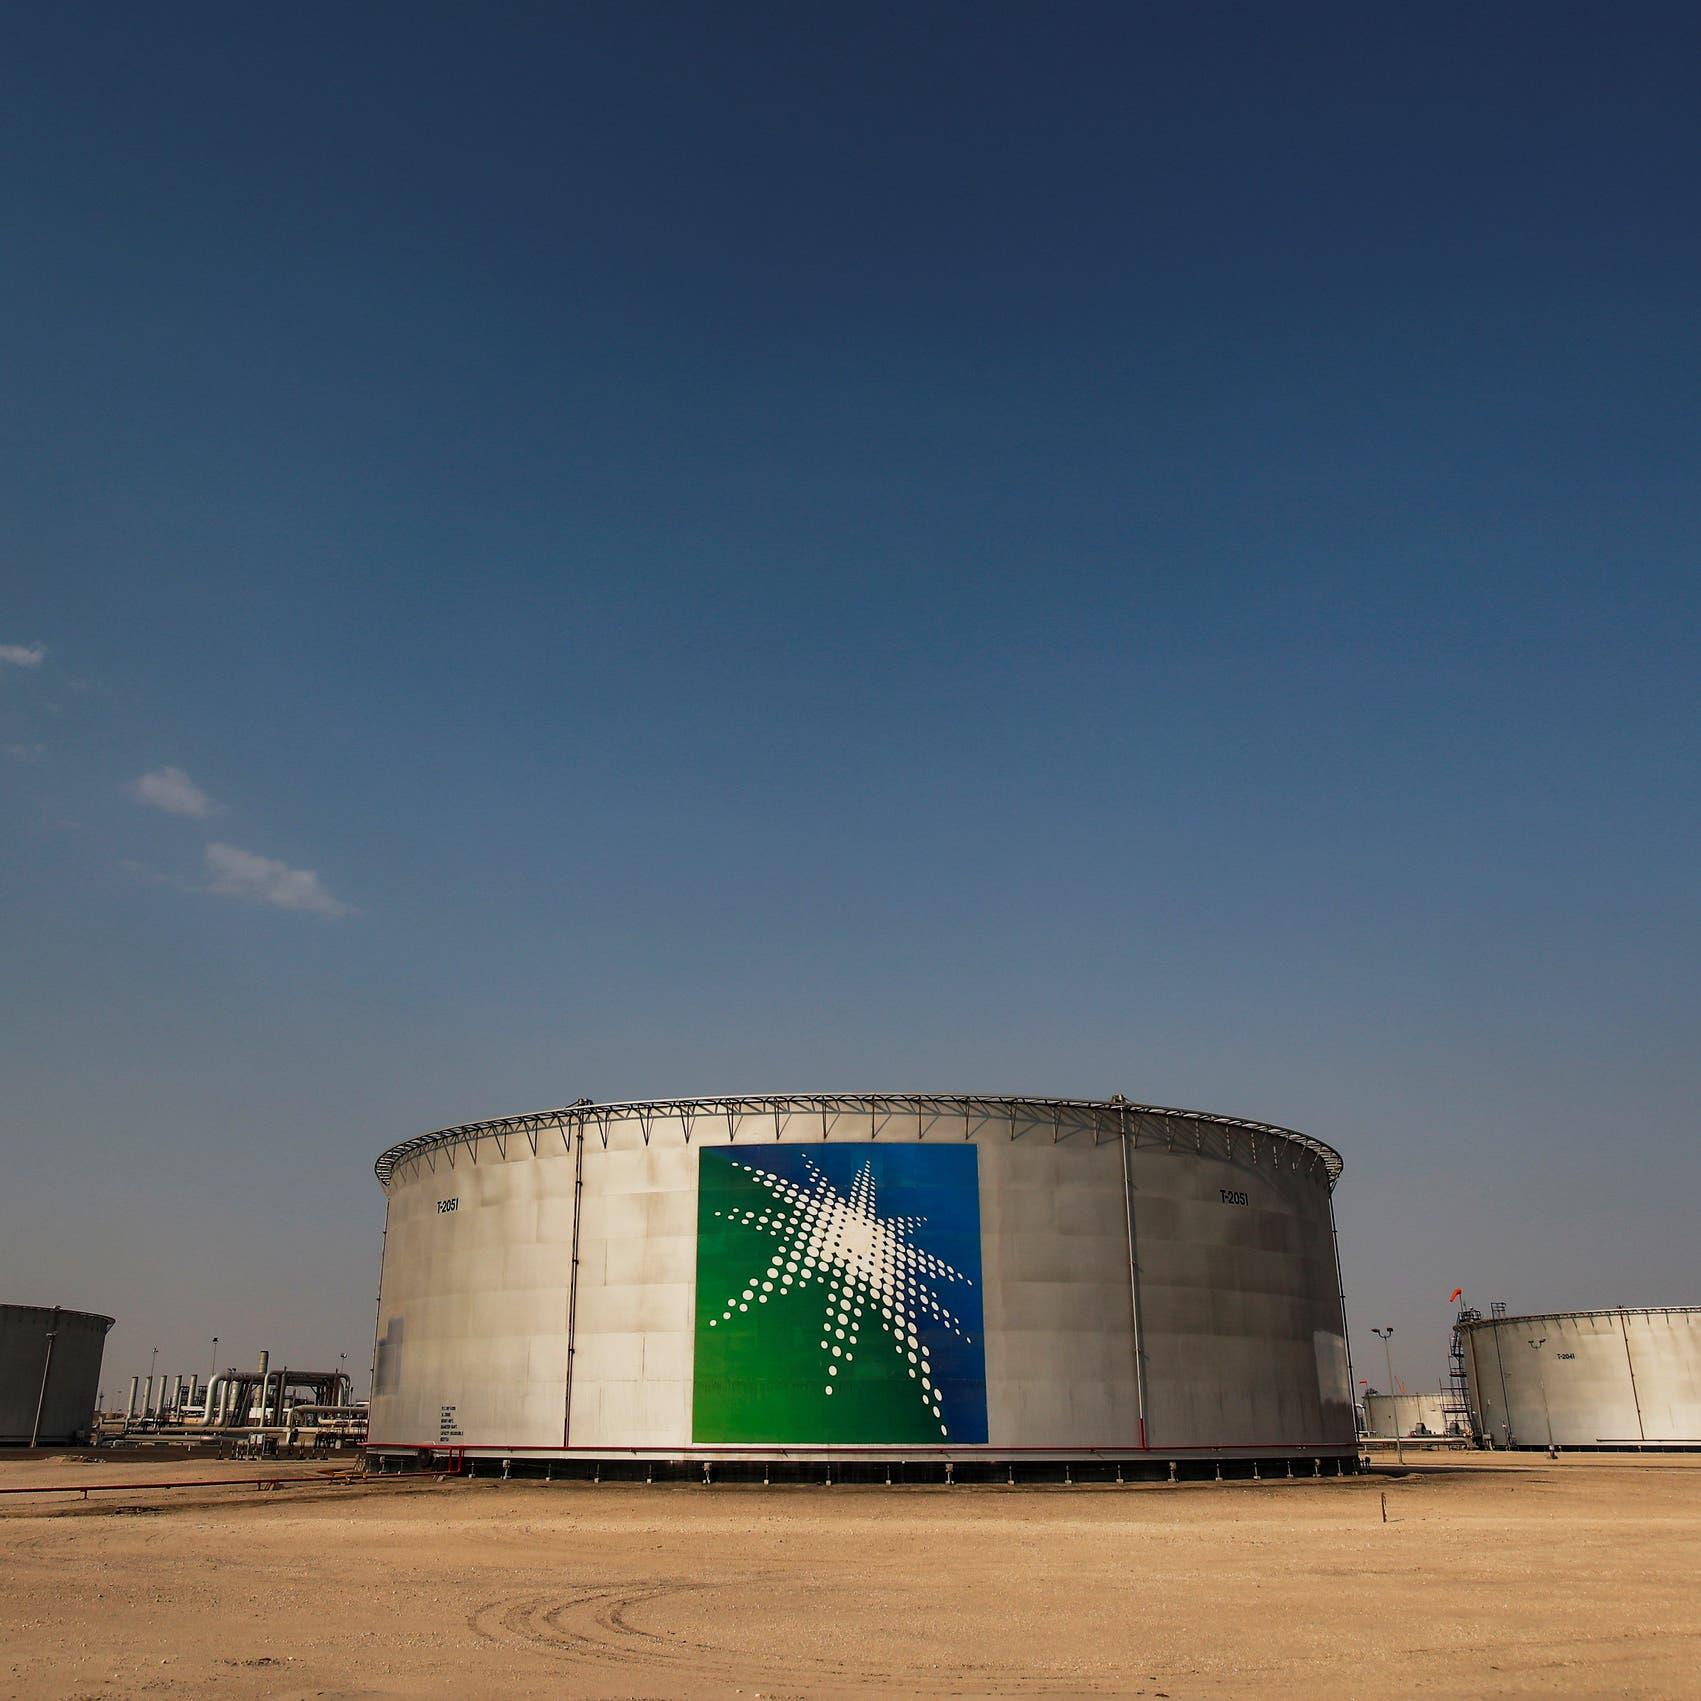 Saudi Aramco says oil profit slid 44.4 pct in 2020